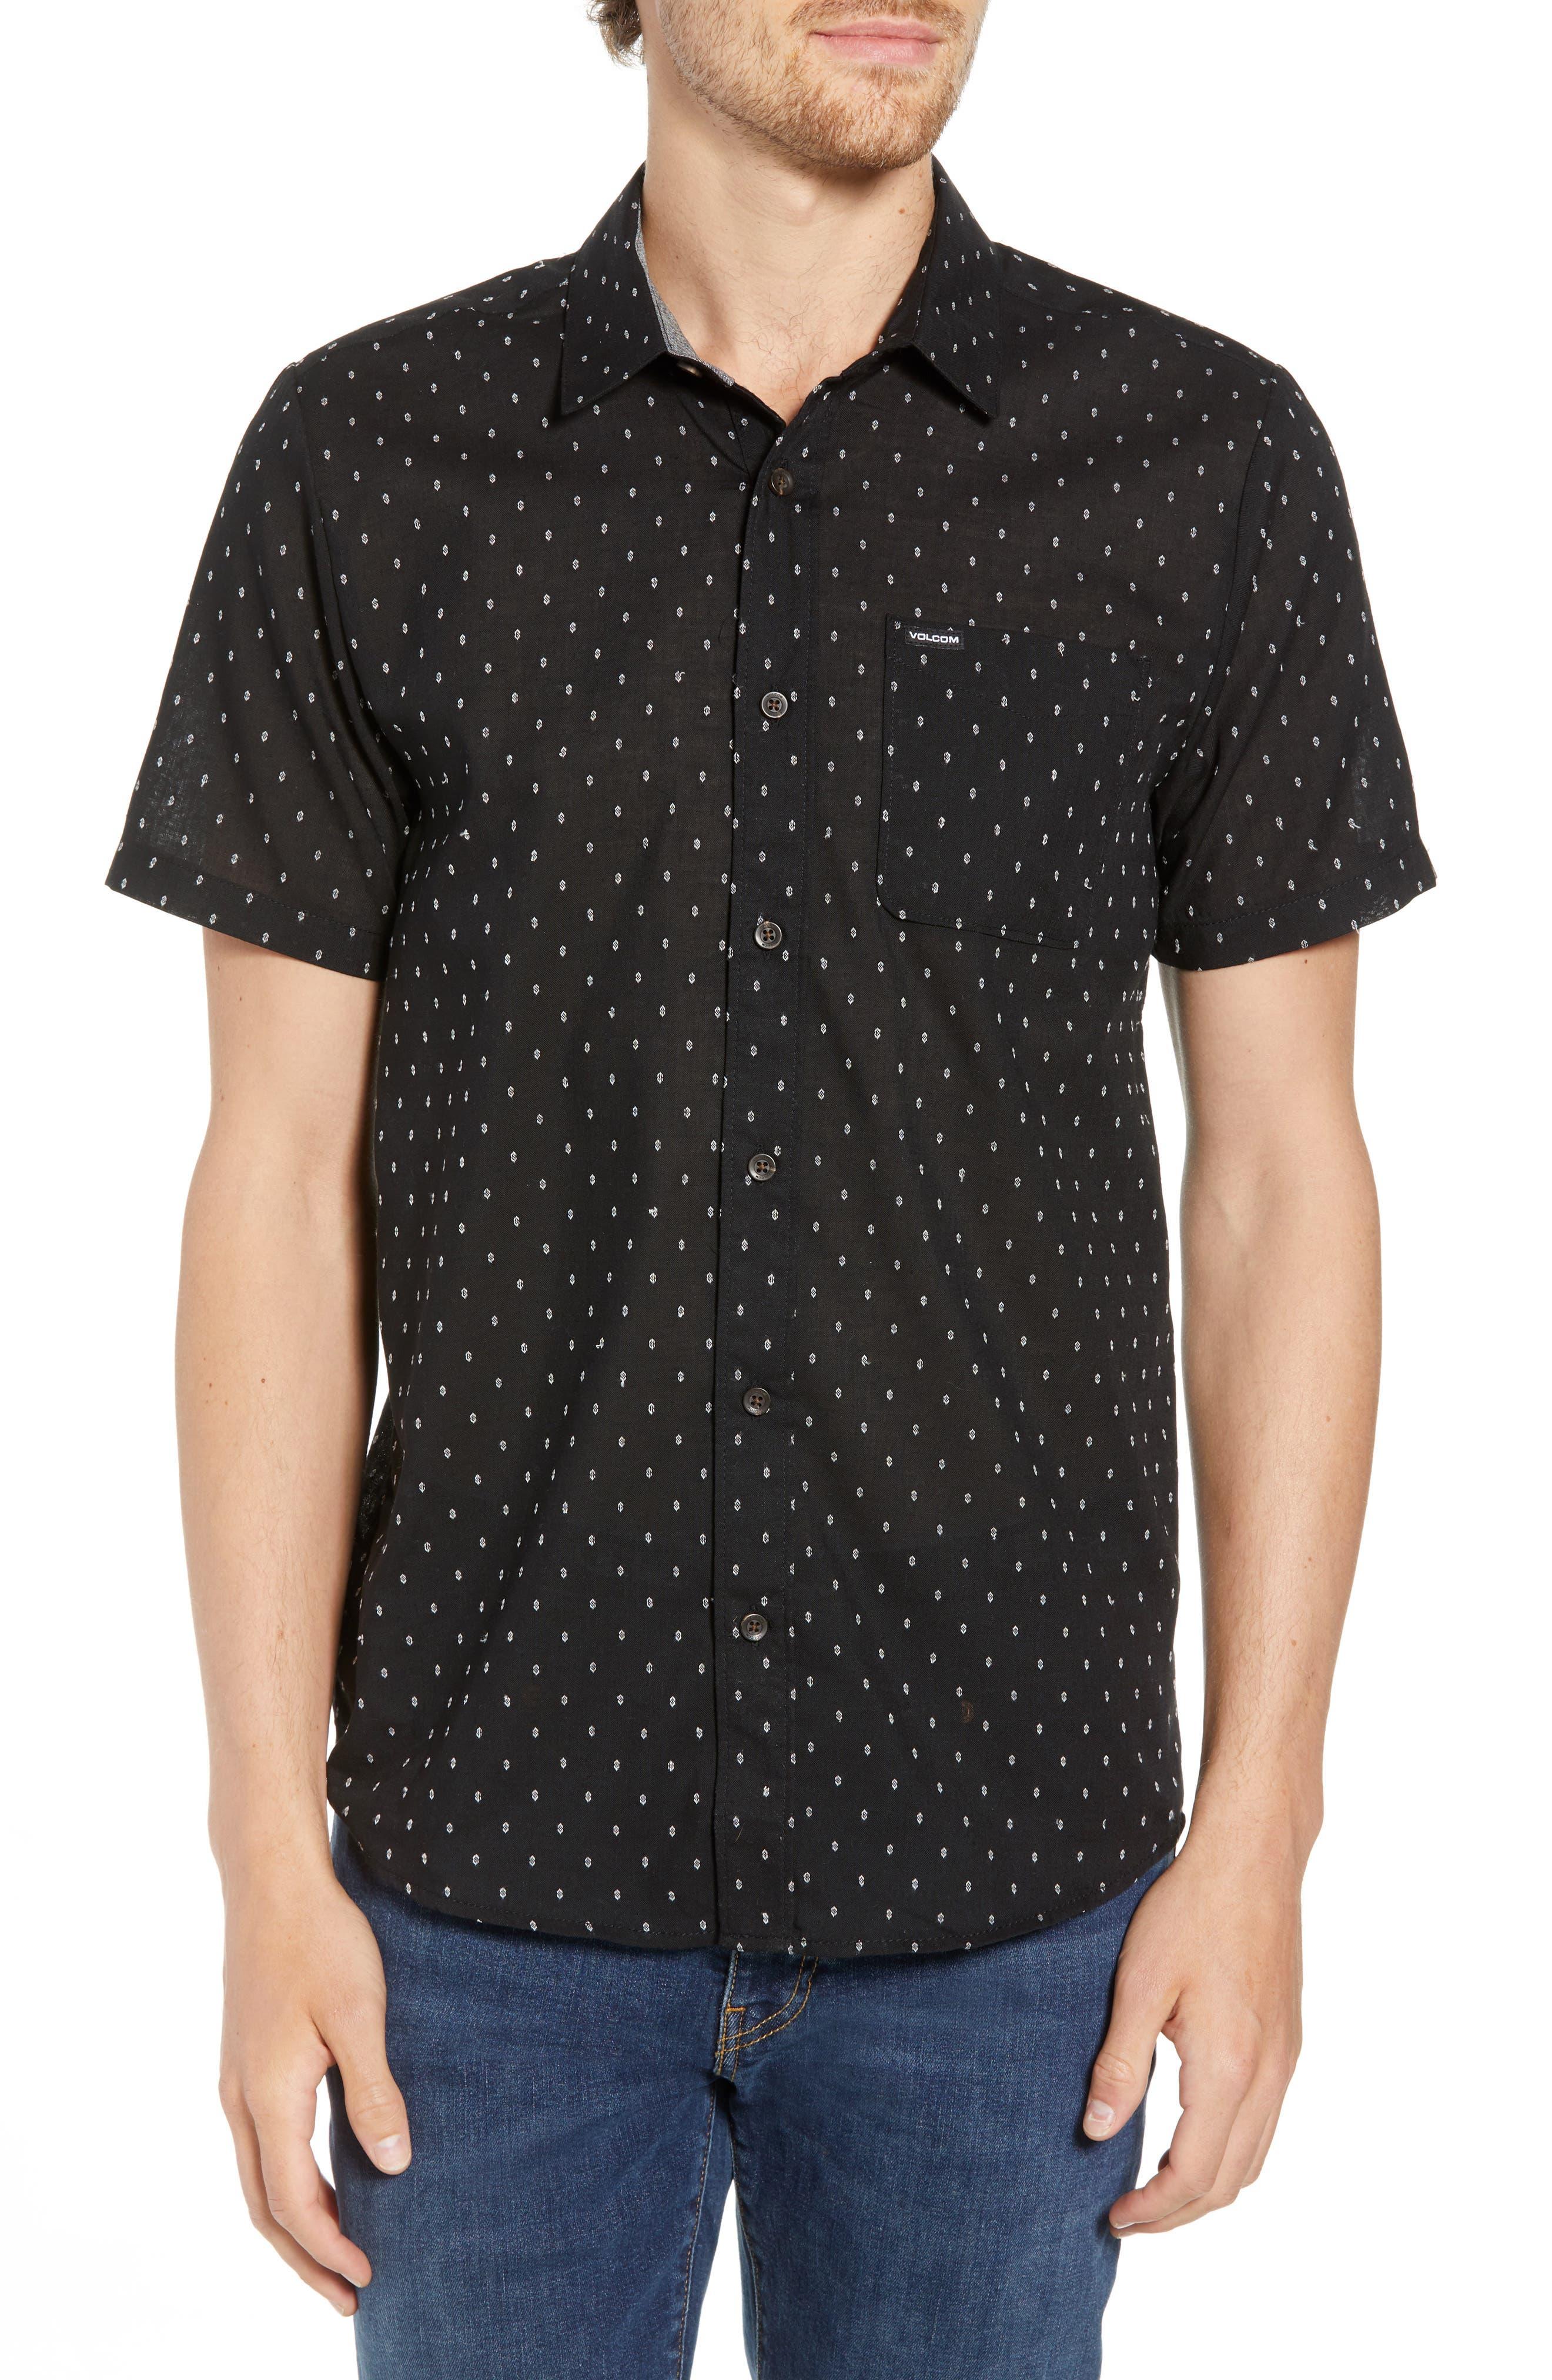 Dobler Woven Shirt,                         Main,                         color, 001